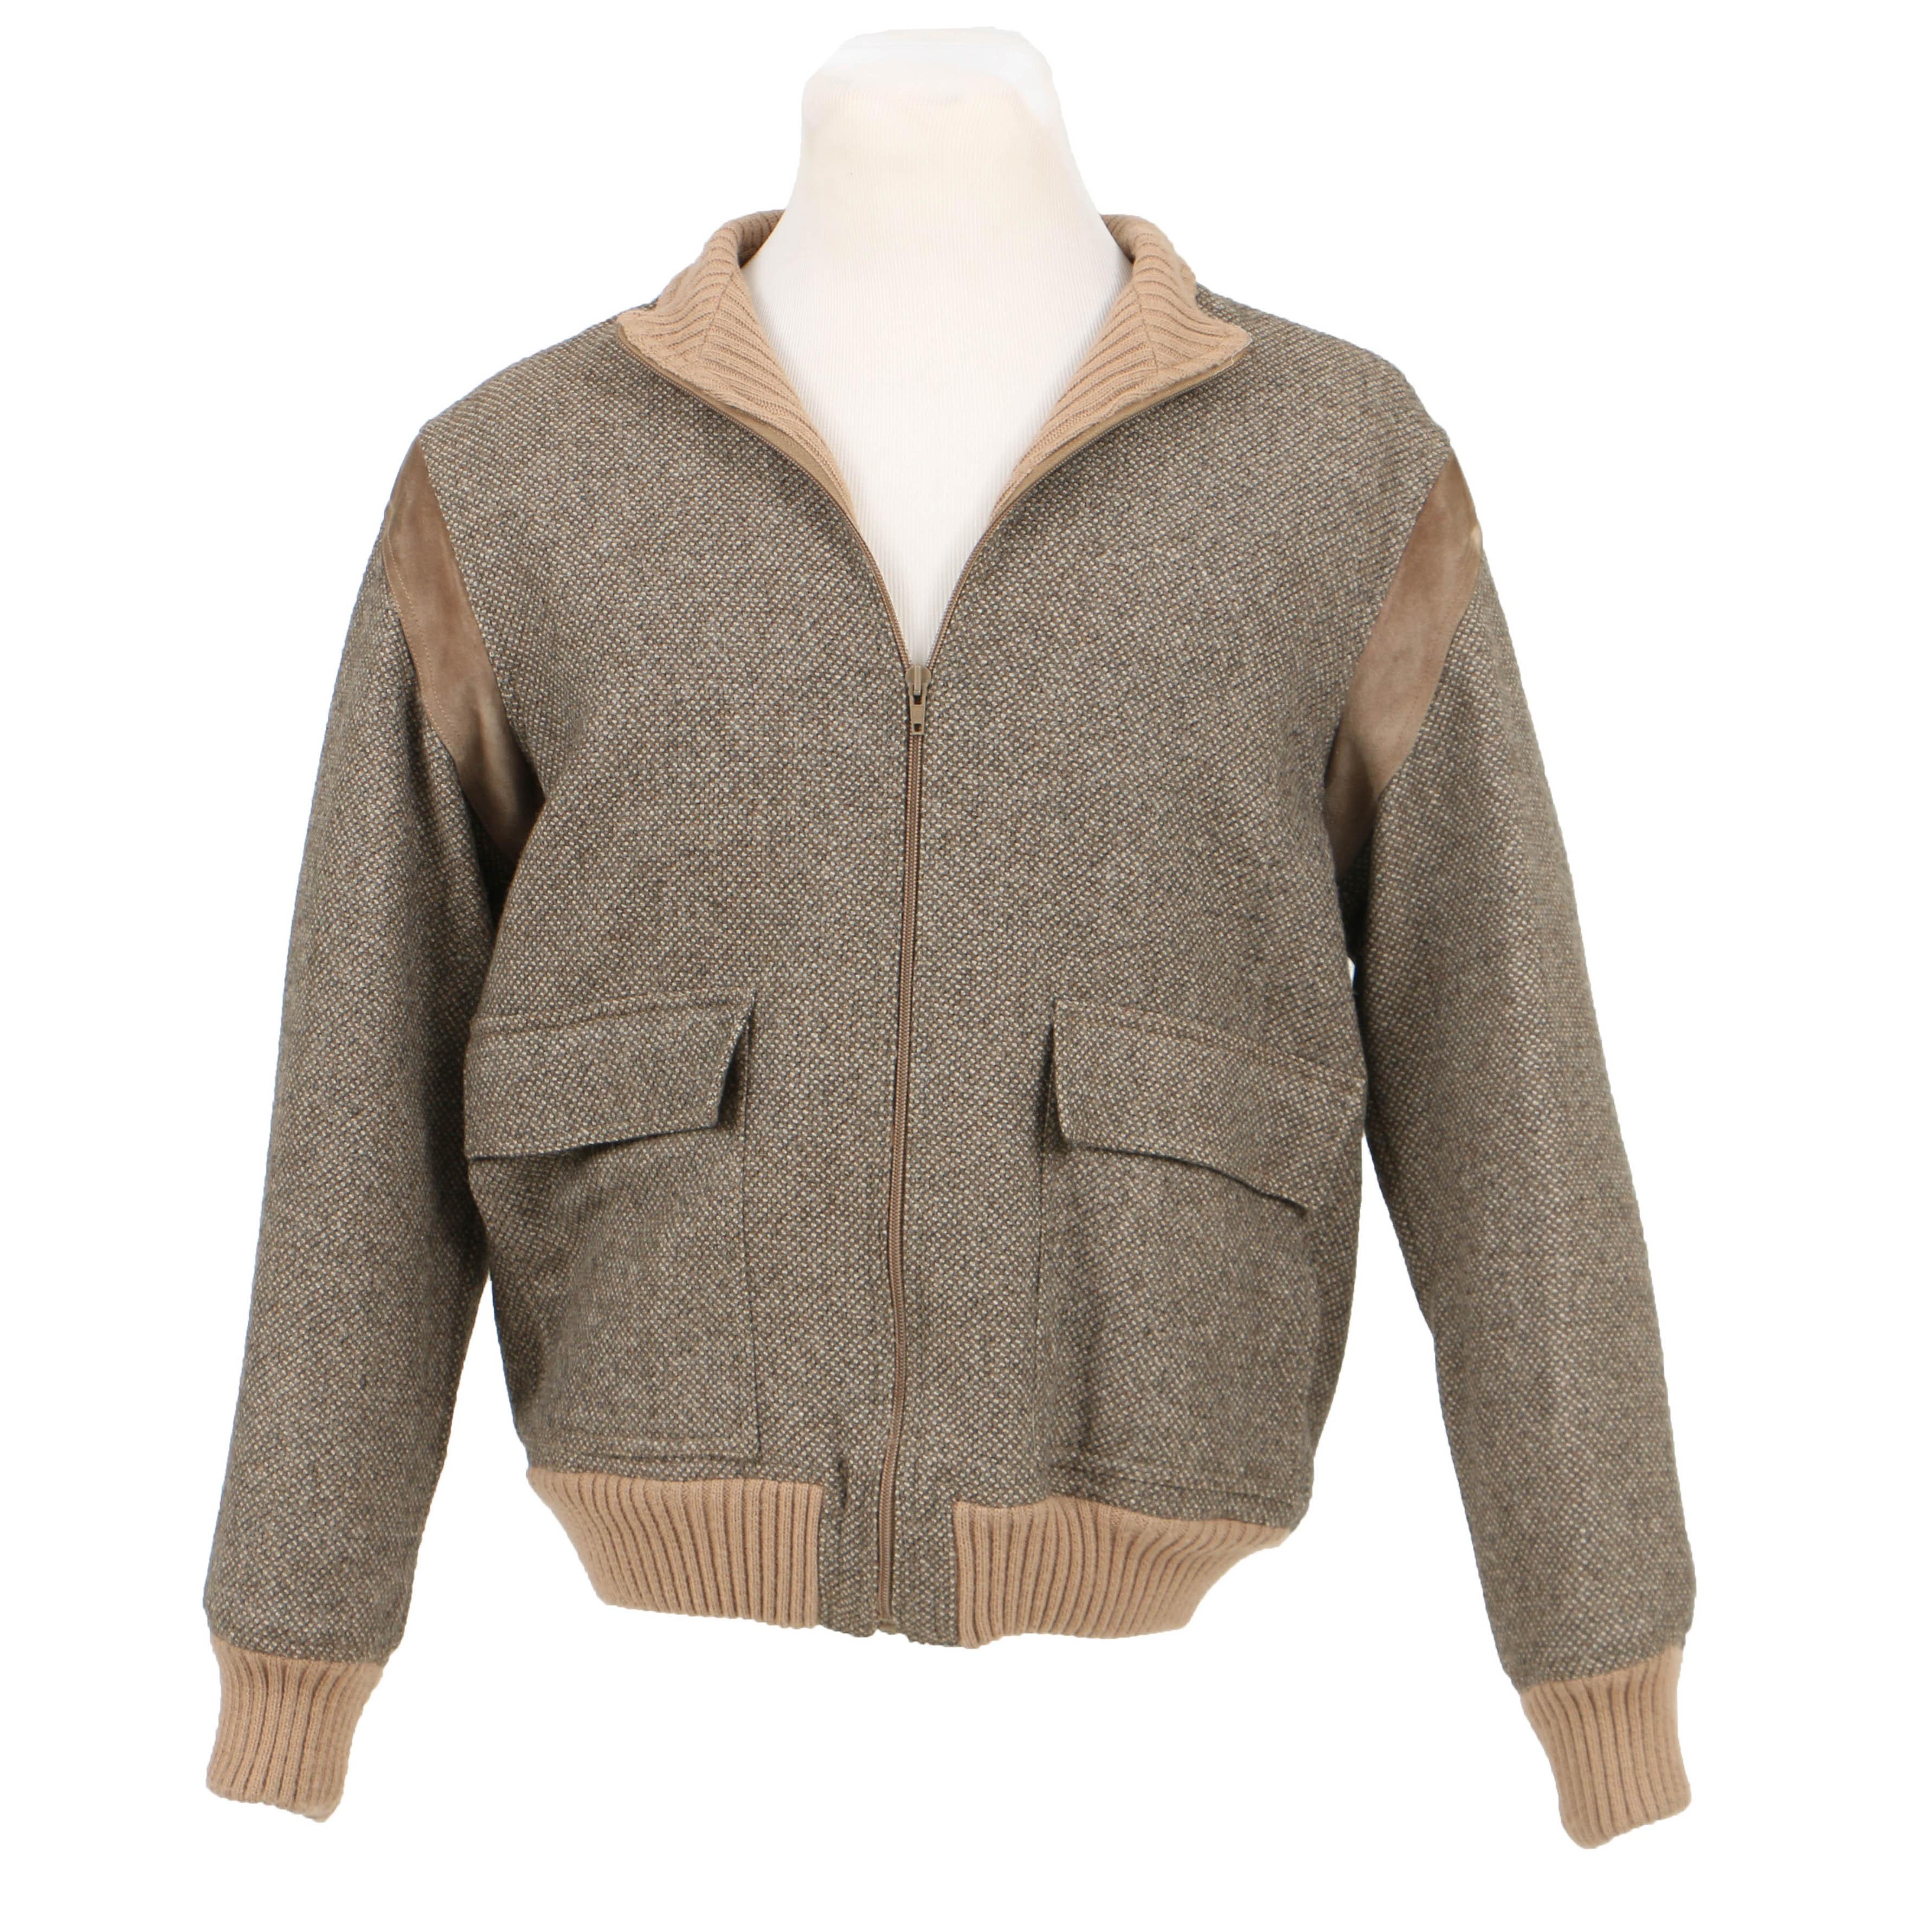 Vintage Italian G. Gucci Wool Jacket